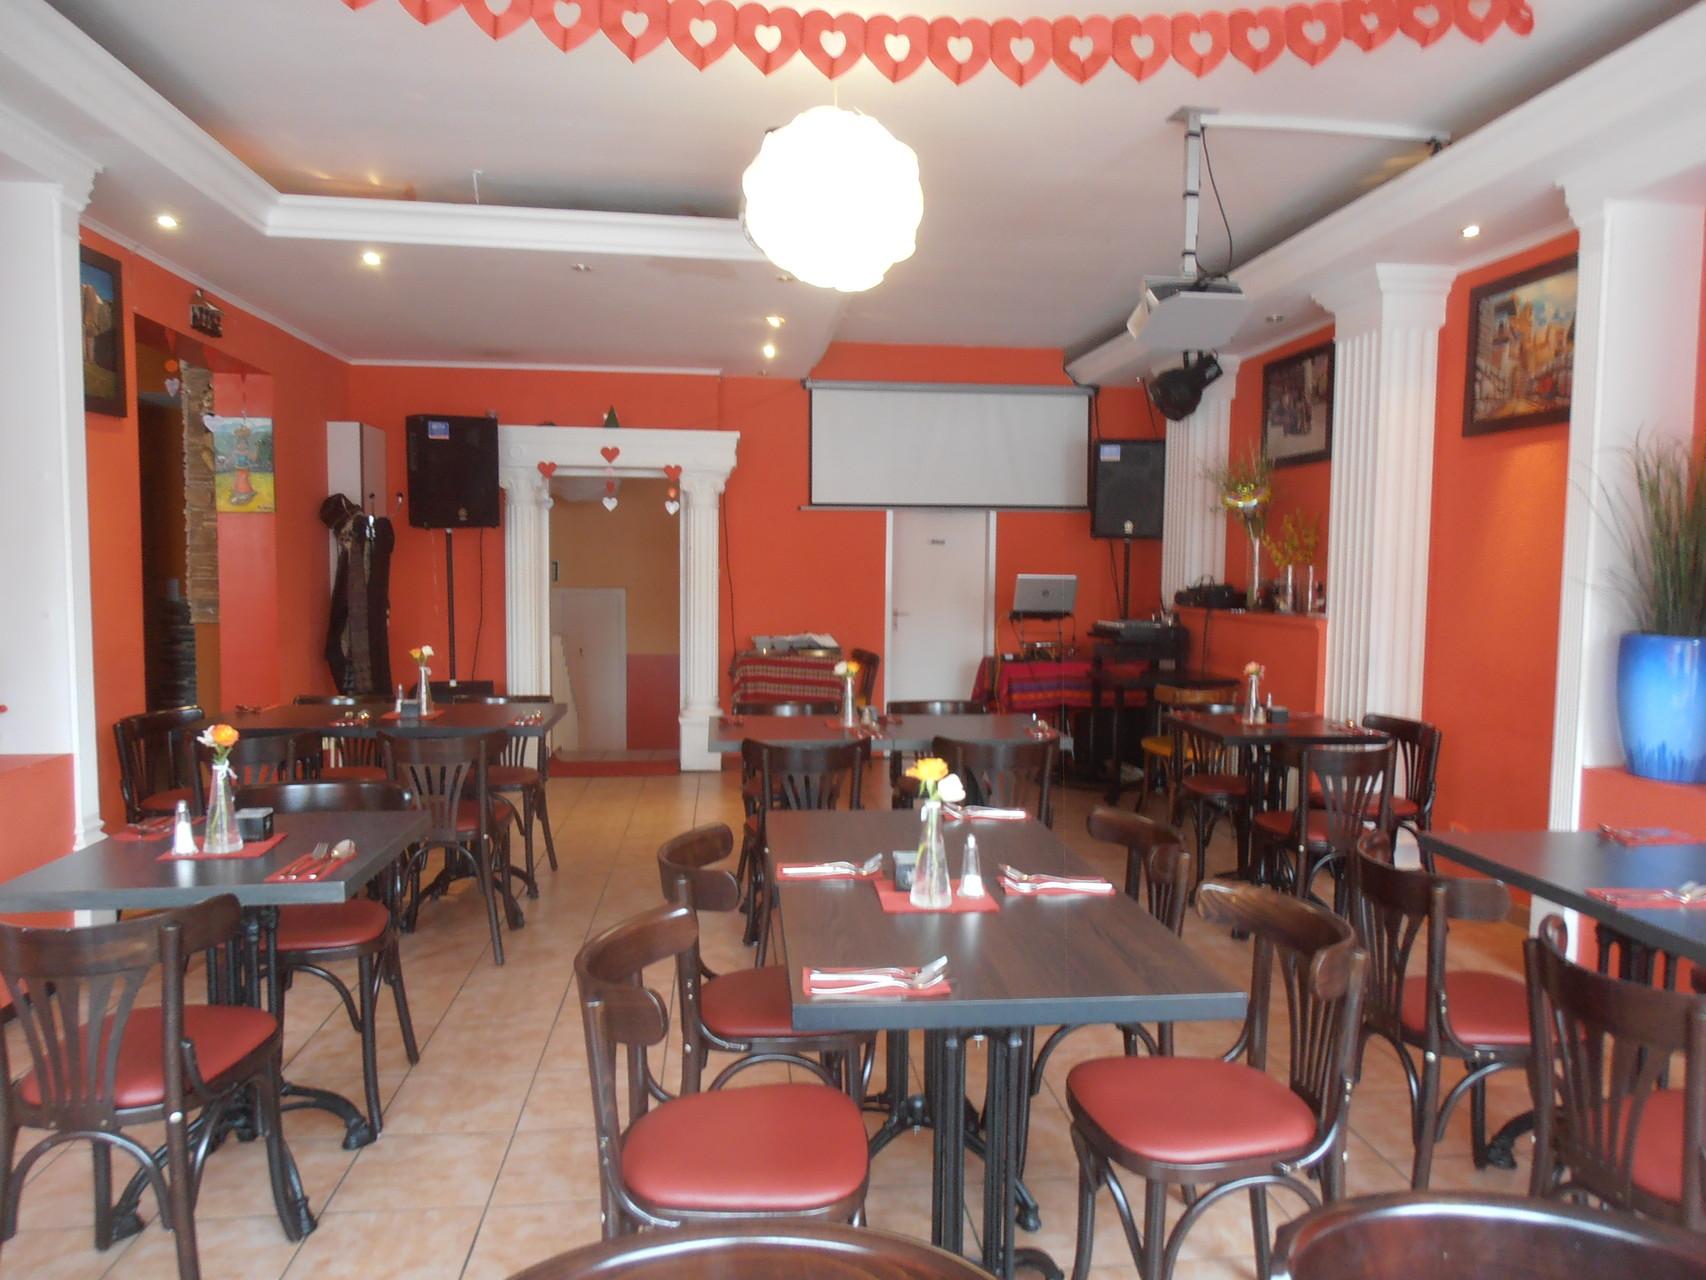 Ehemalige Bistro Bar - MI BARRIO - Lateinamerikanische Spezialitäten - Reeperbahn 153 Hamburg St. Pauli